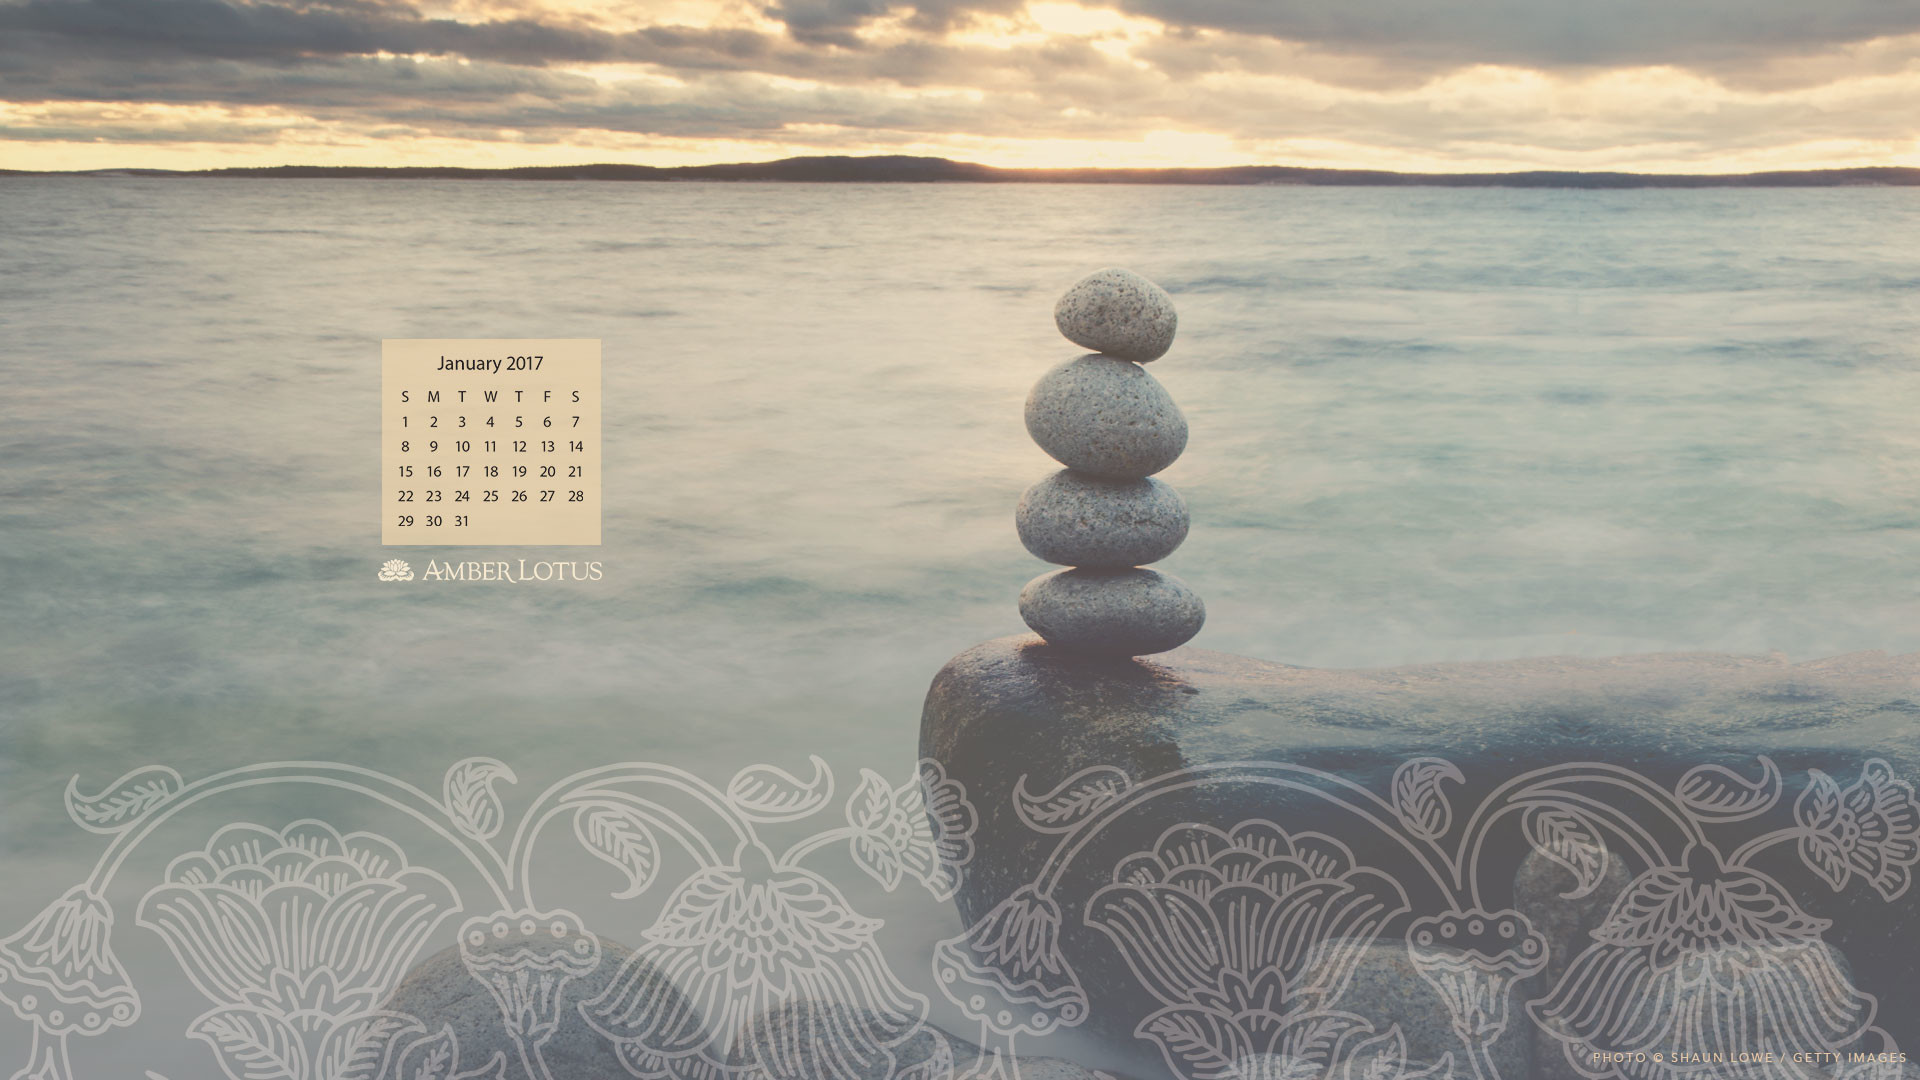 Free January 2017 desktop wallpaper